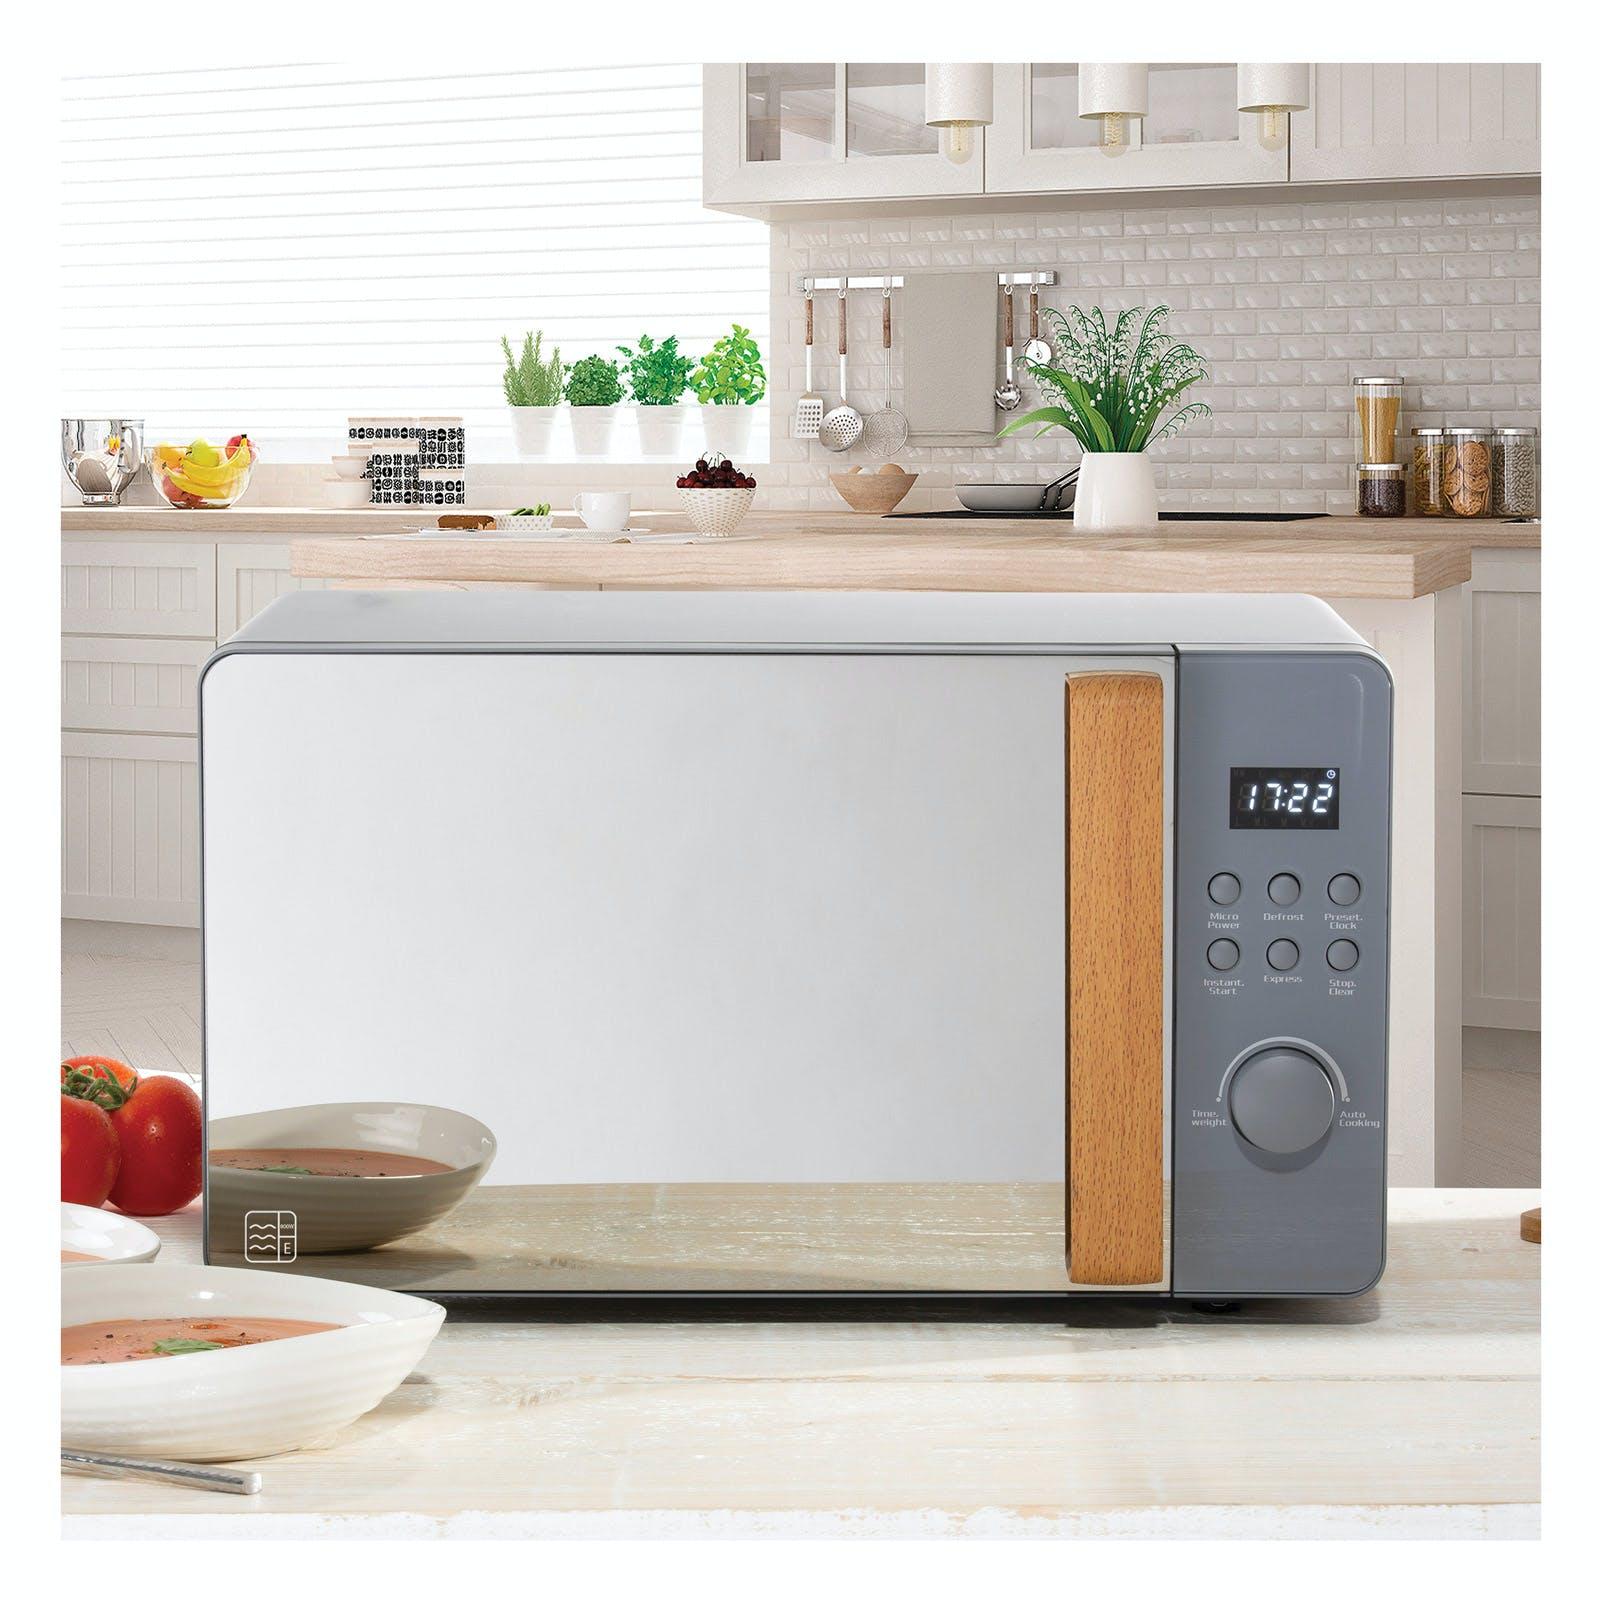 Daewoo Sda1704ge Skandik Microwave Oven In Grey 20l 800w